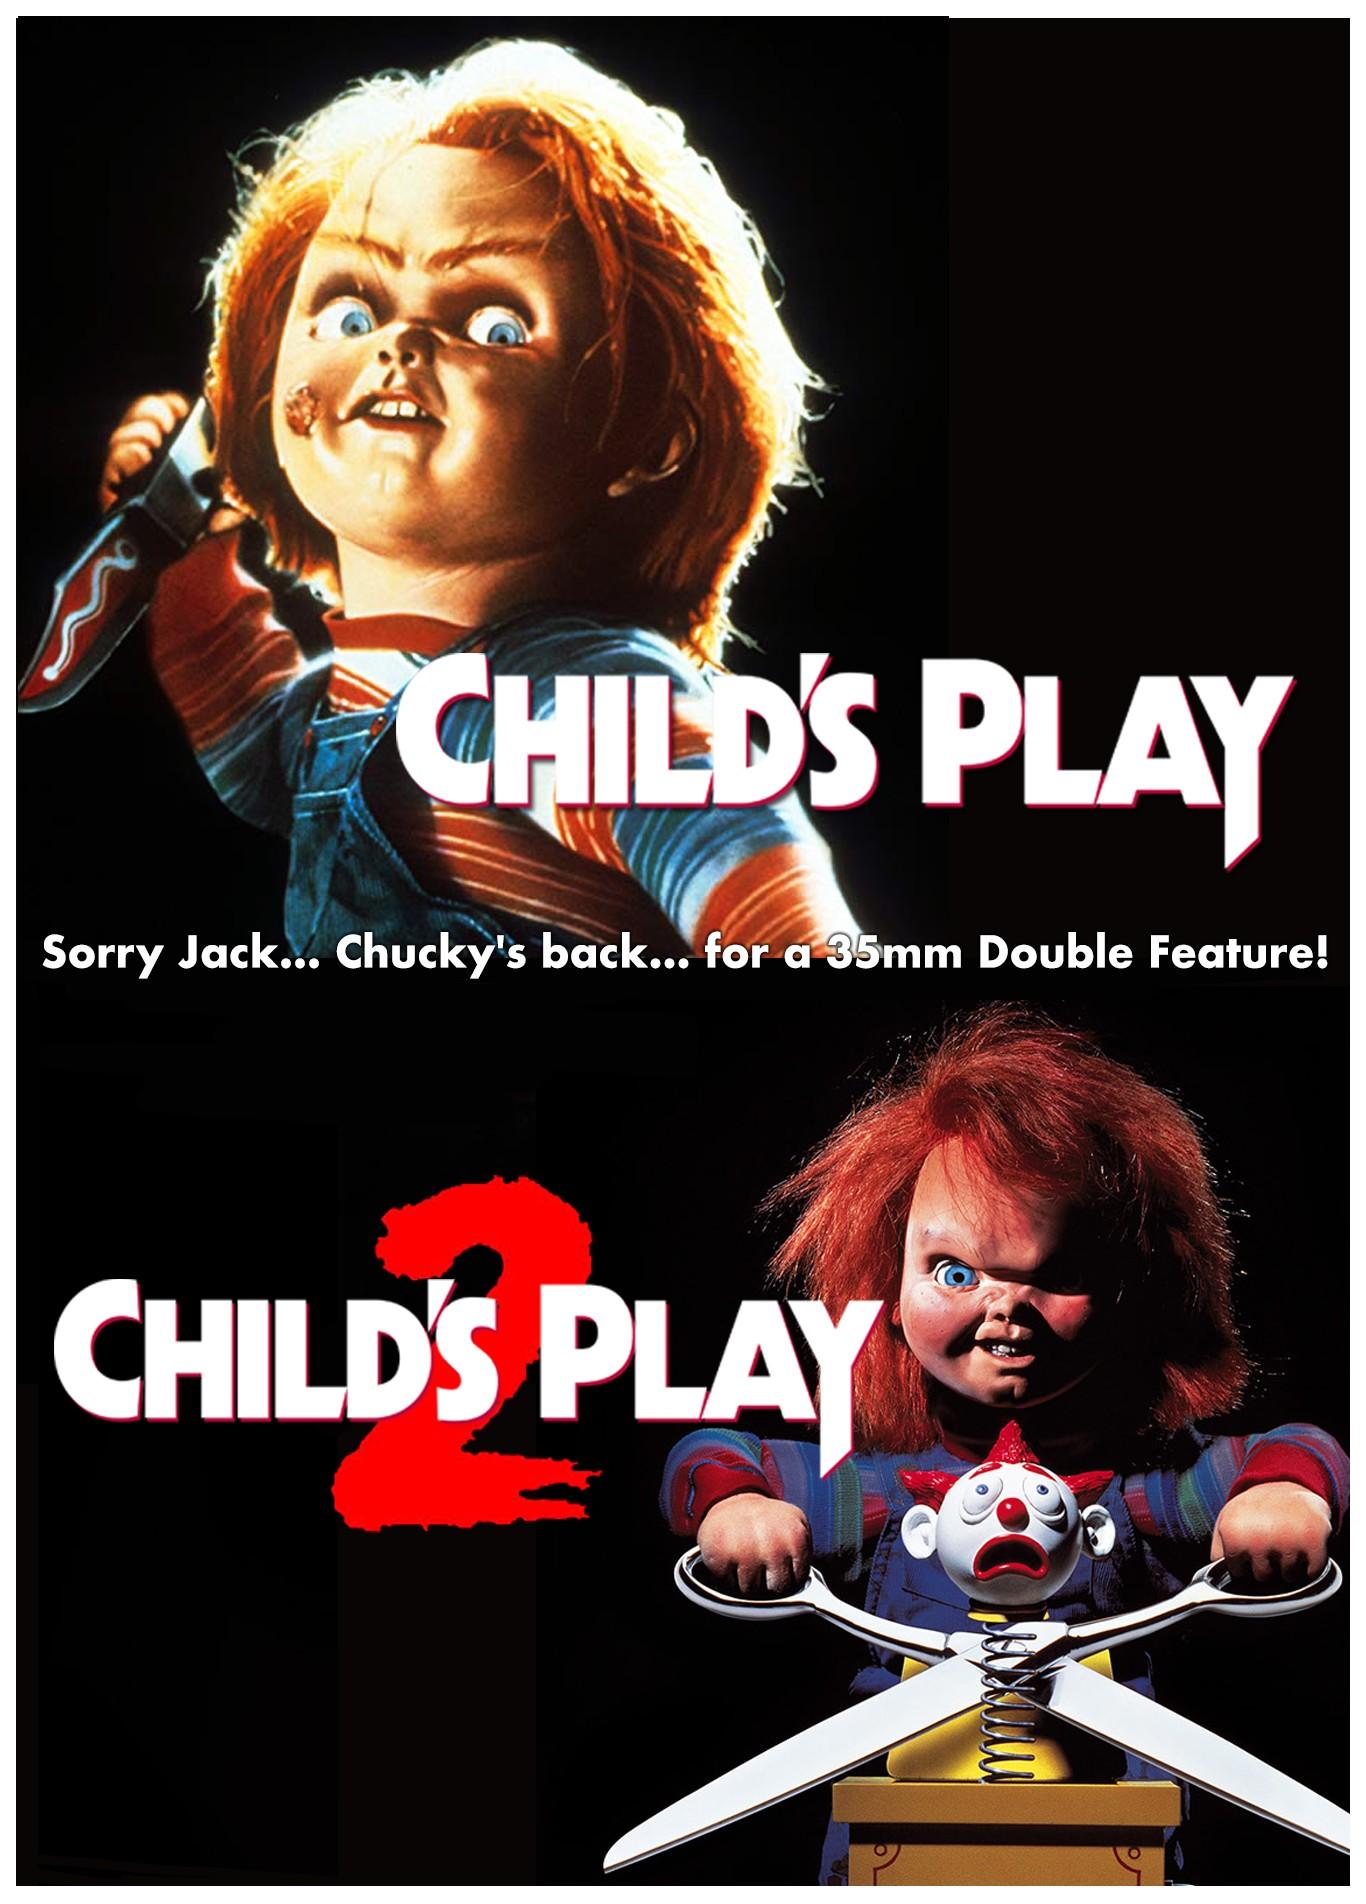 CHILD'S PLAY 1 & 2